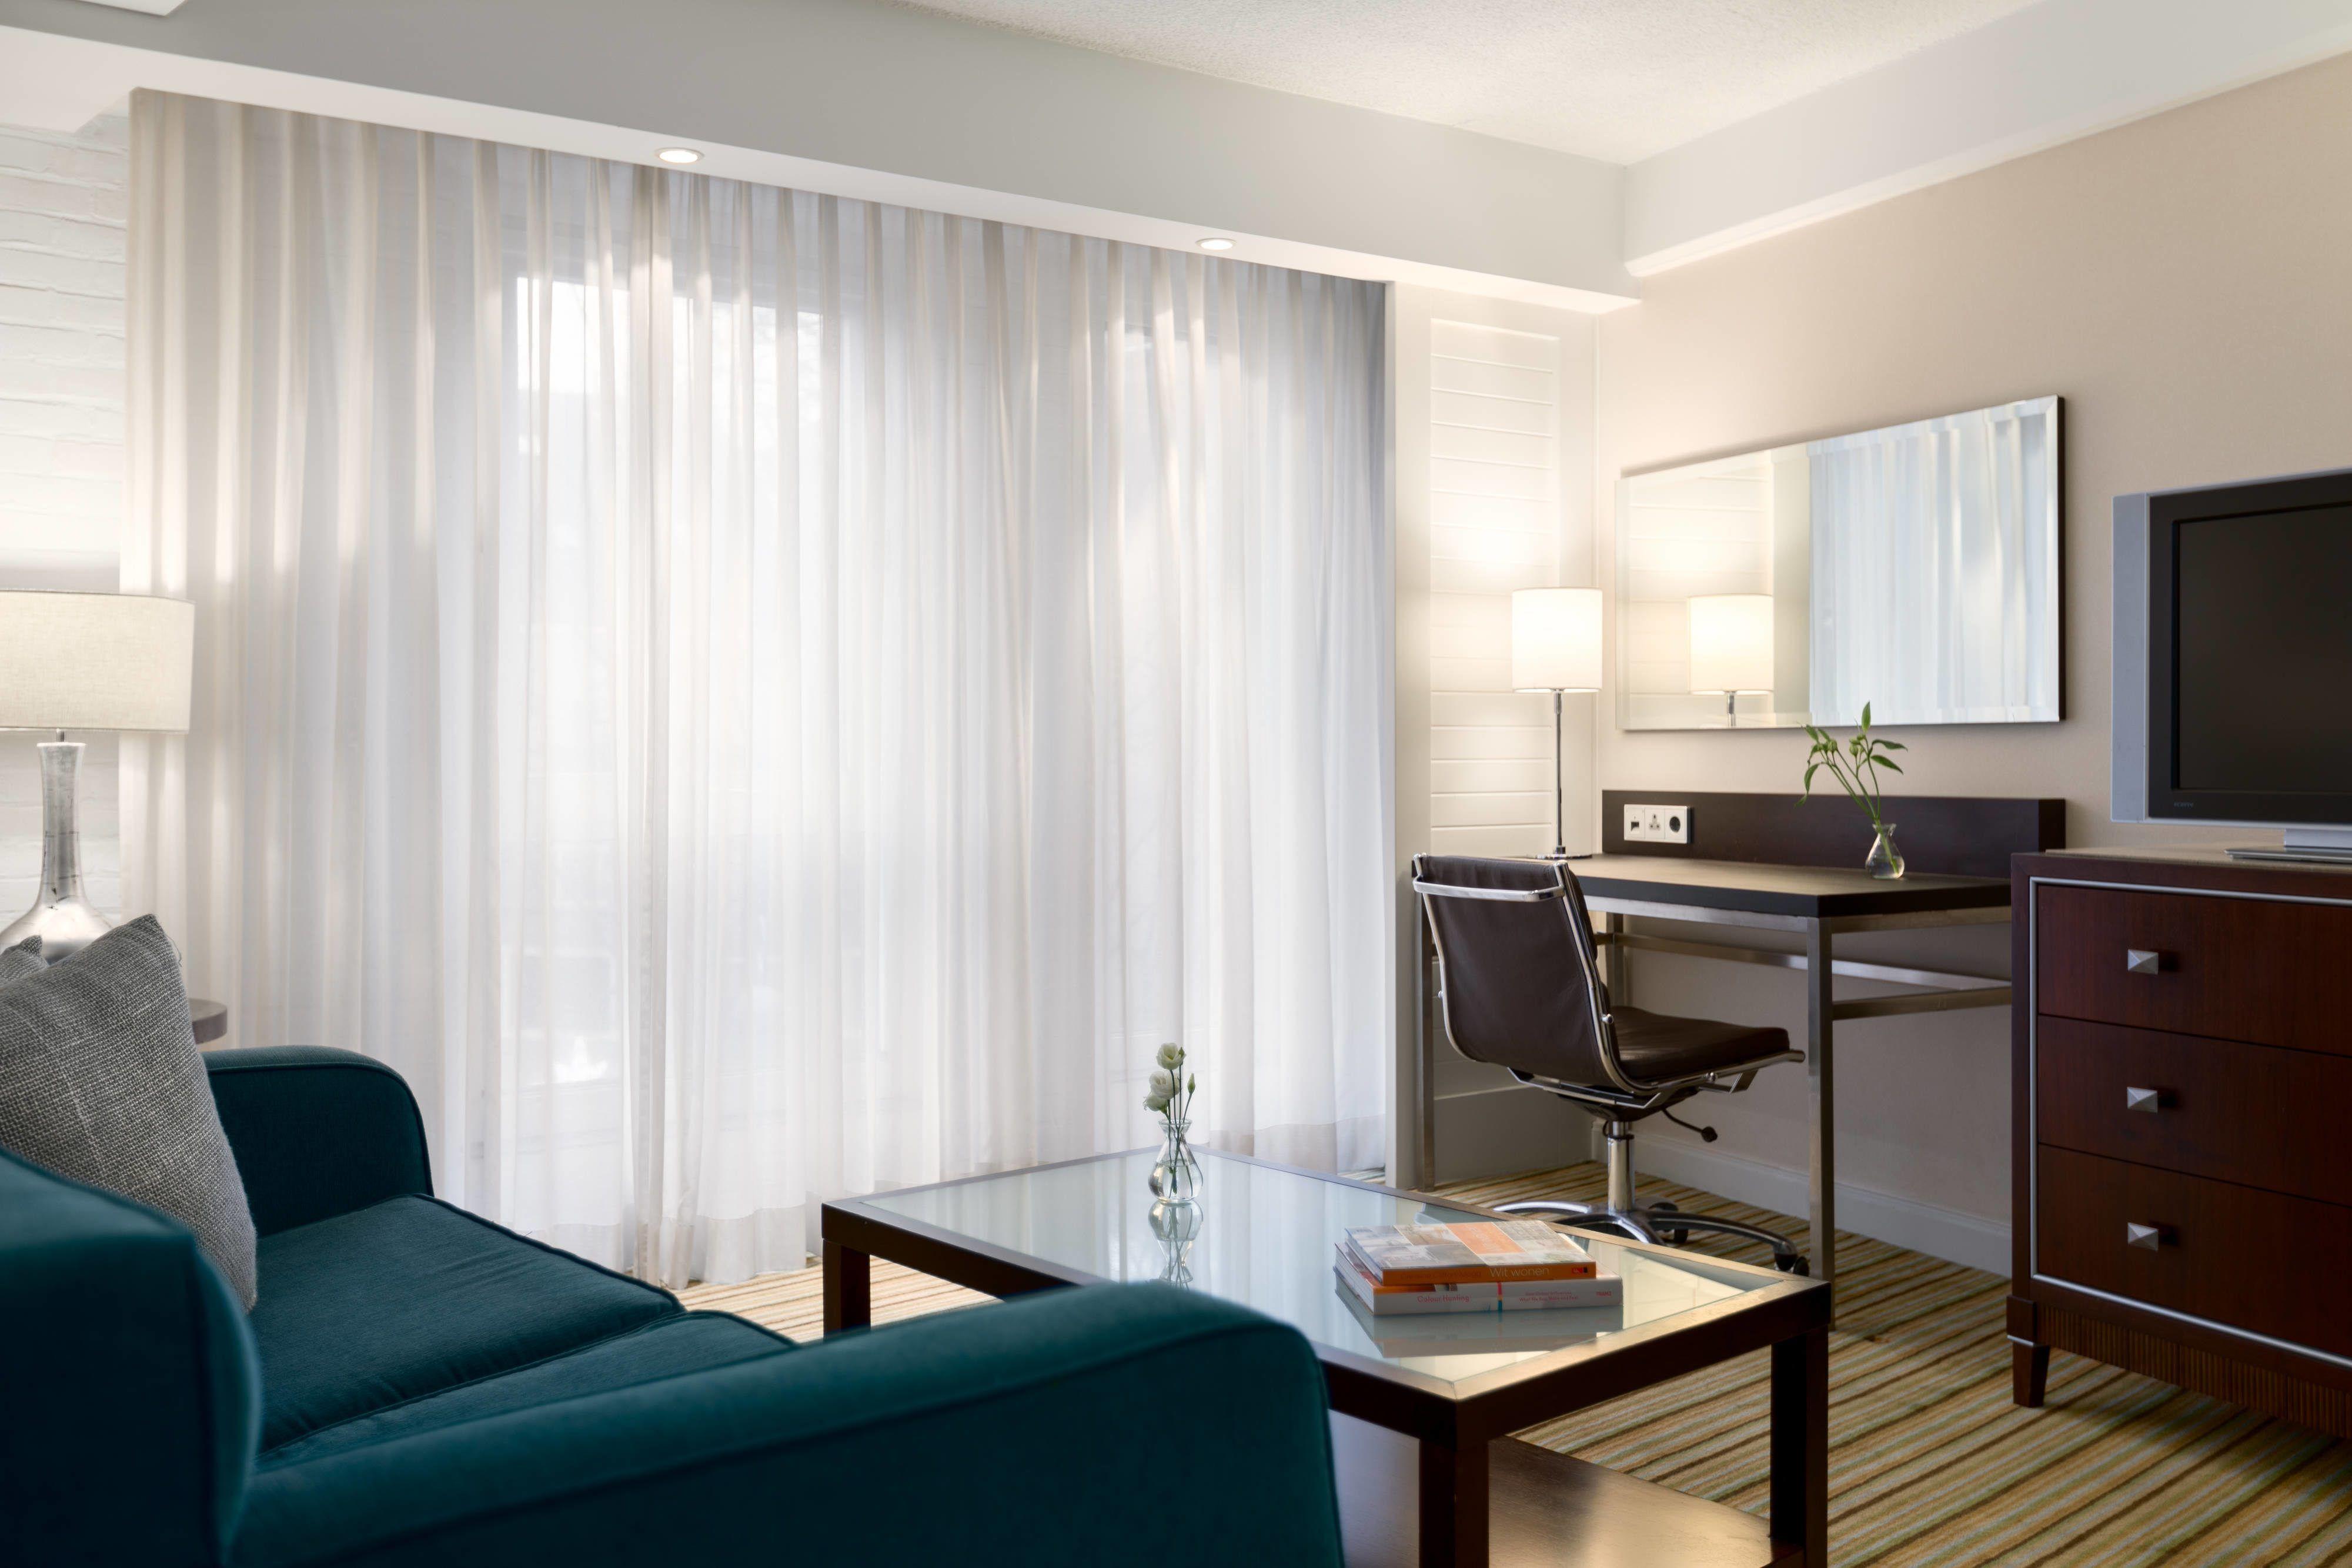 Renaissance Amsterdam Hotel Superior Guest Room #Guestbathroom, #Guestroom, #Relax,